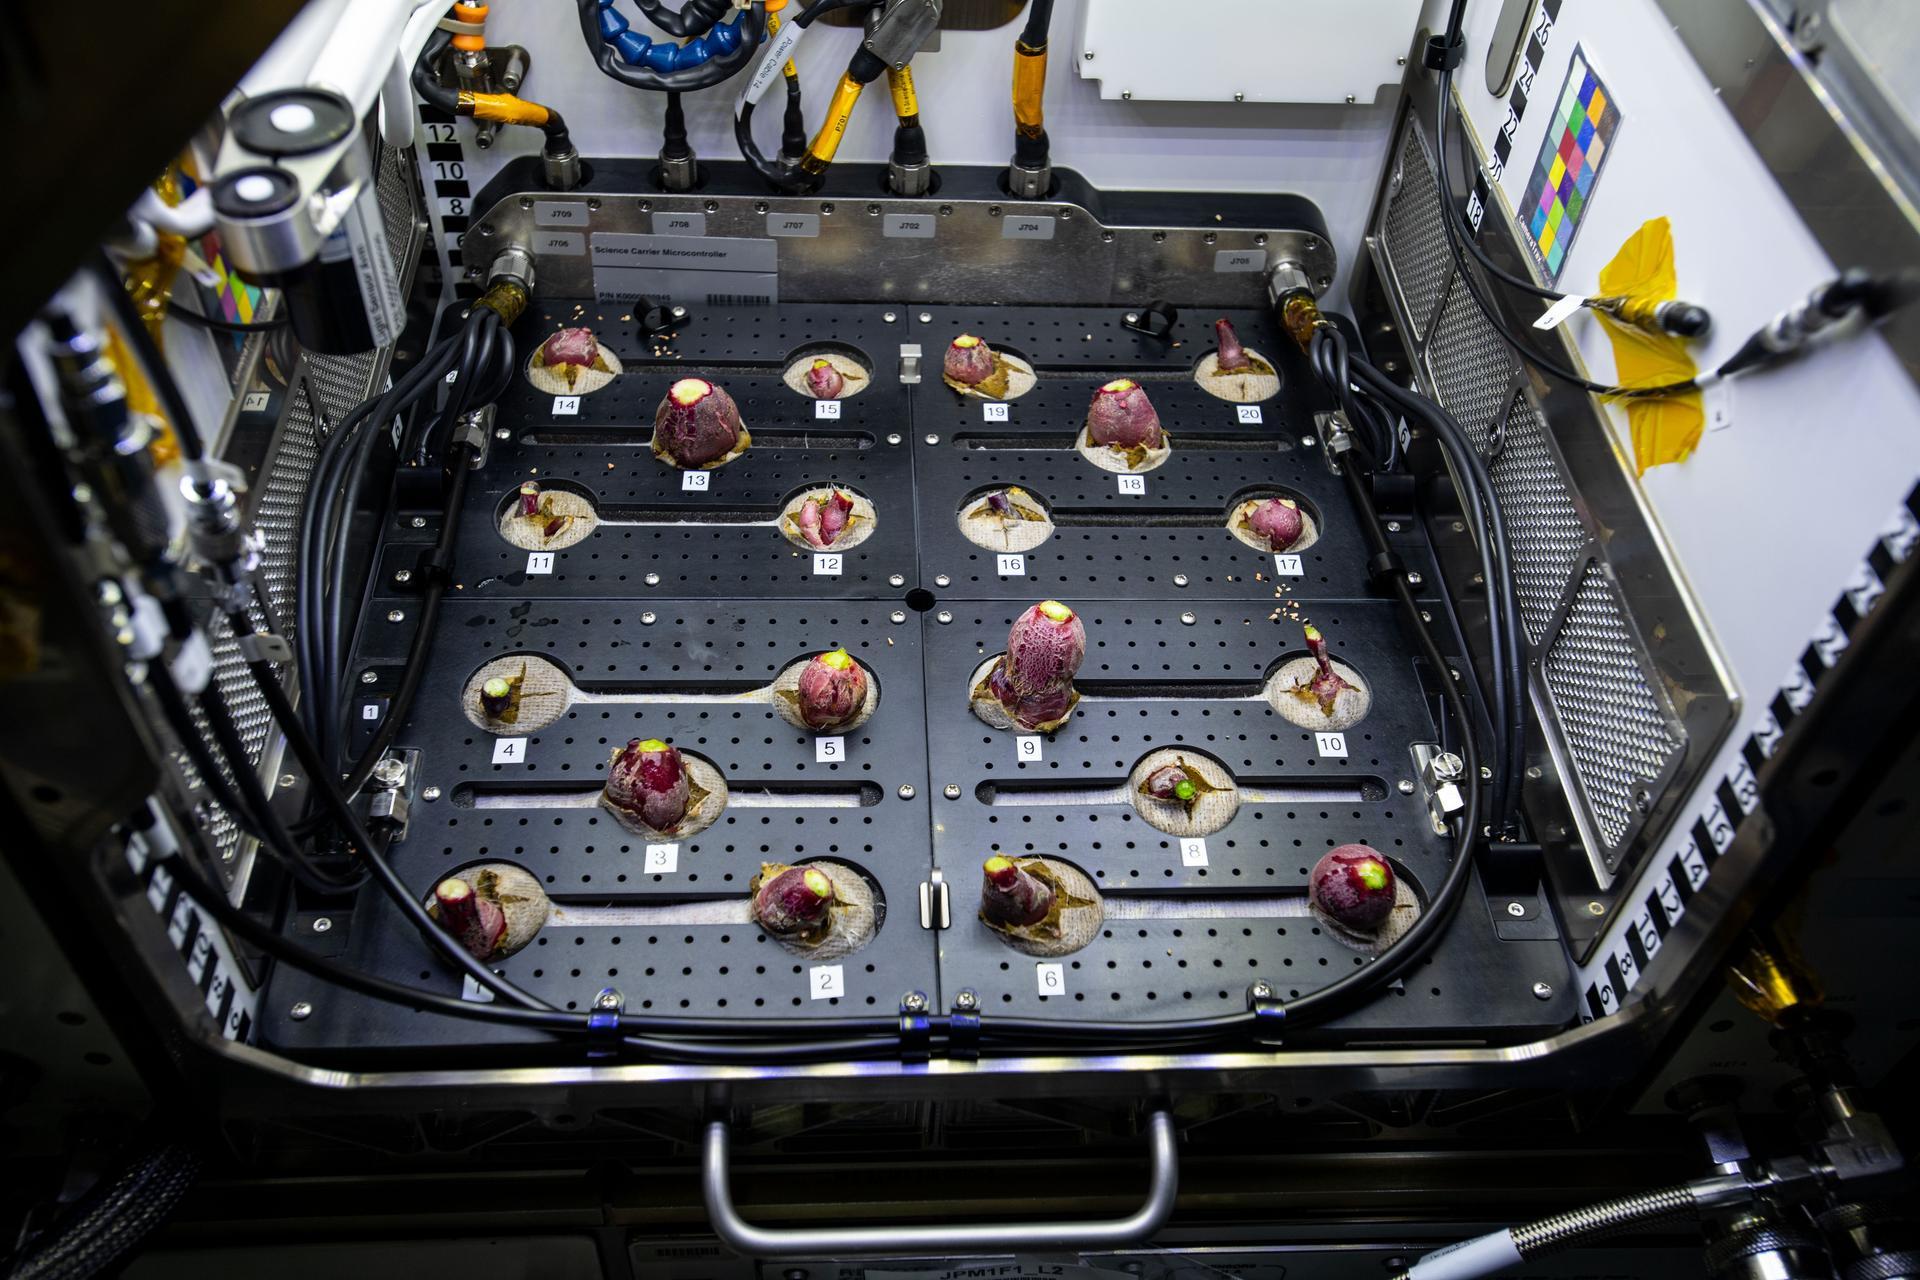 Astronauts Harvest First Radish Crop on International Space Station   NASA